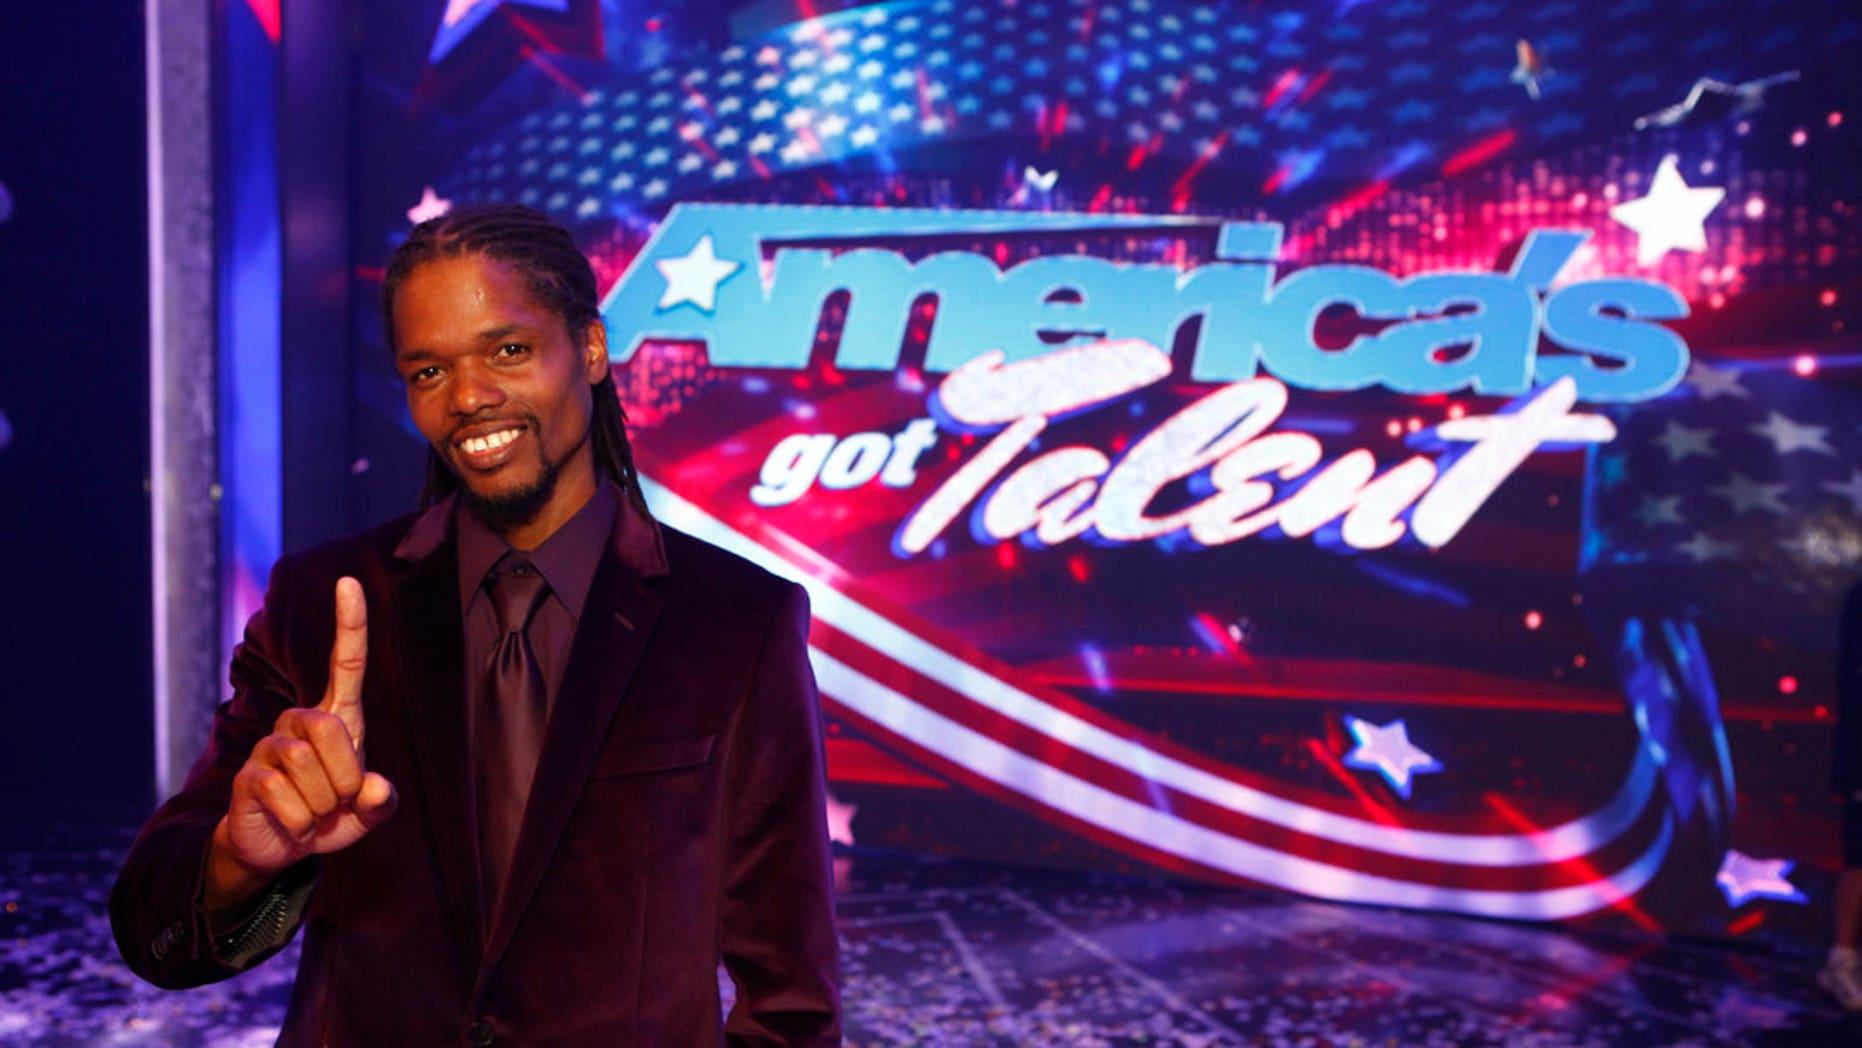 """America's Got Talent"" Season 6 winner, Landau Eugene Murphy Jr. was arrested on domestic violence charges in West Virginia."